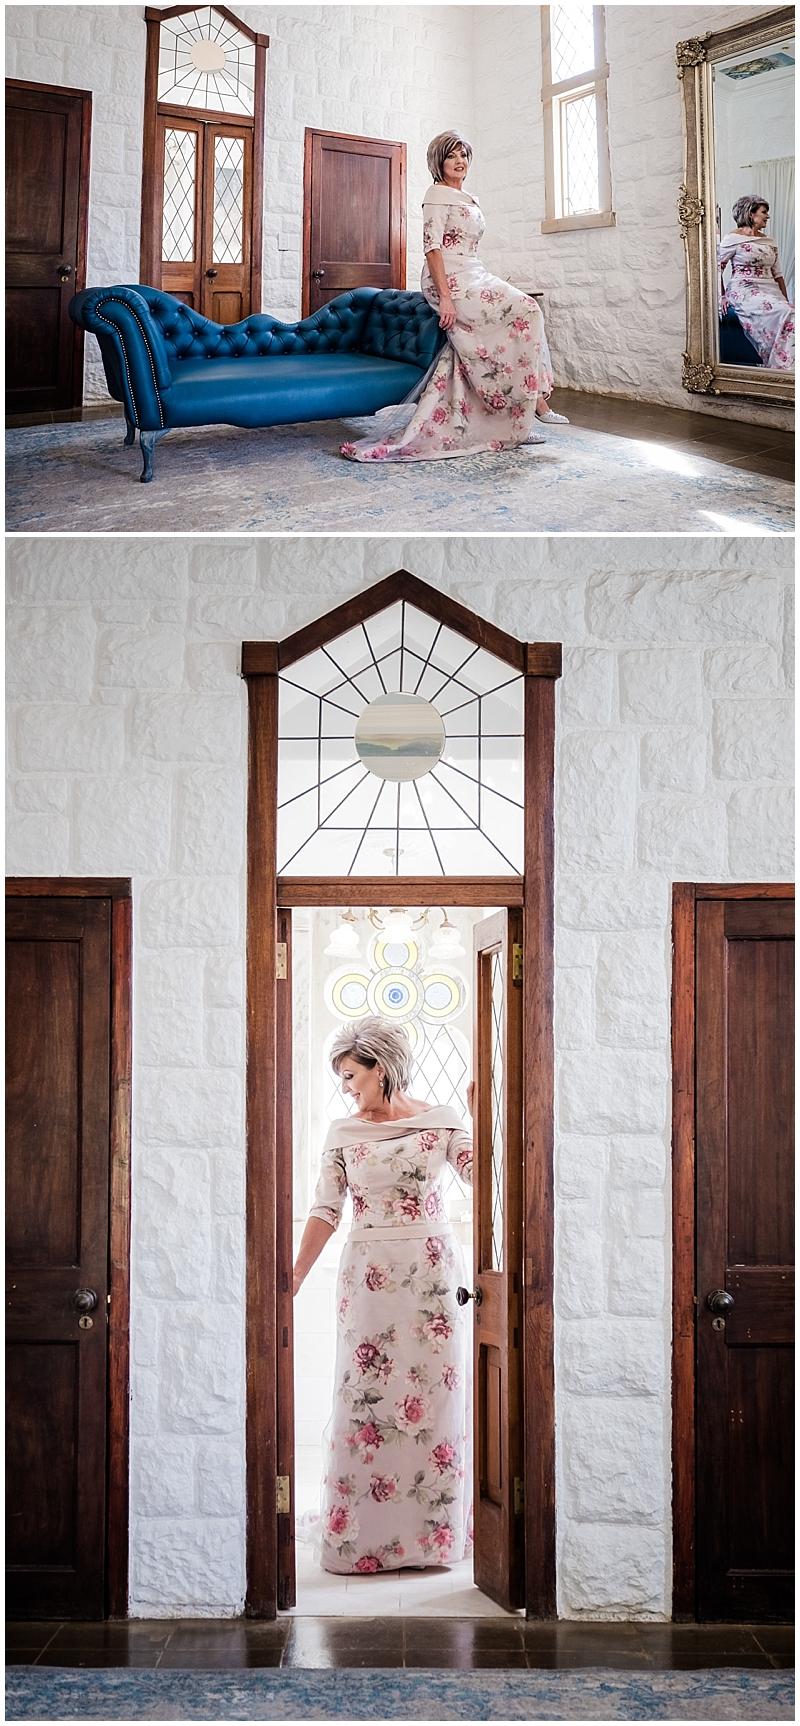 AlexanderSmith-122_AlexanderSmith Best Wedding Photographer-3.jpg